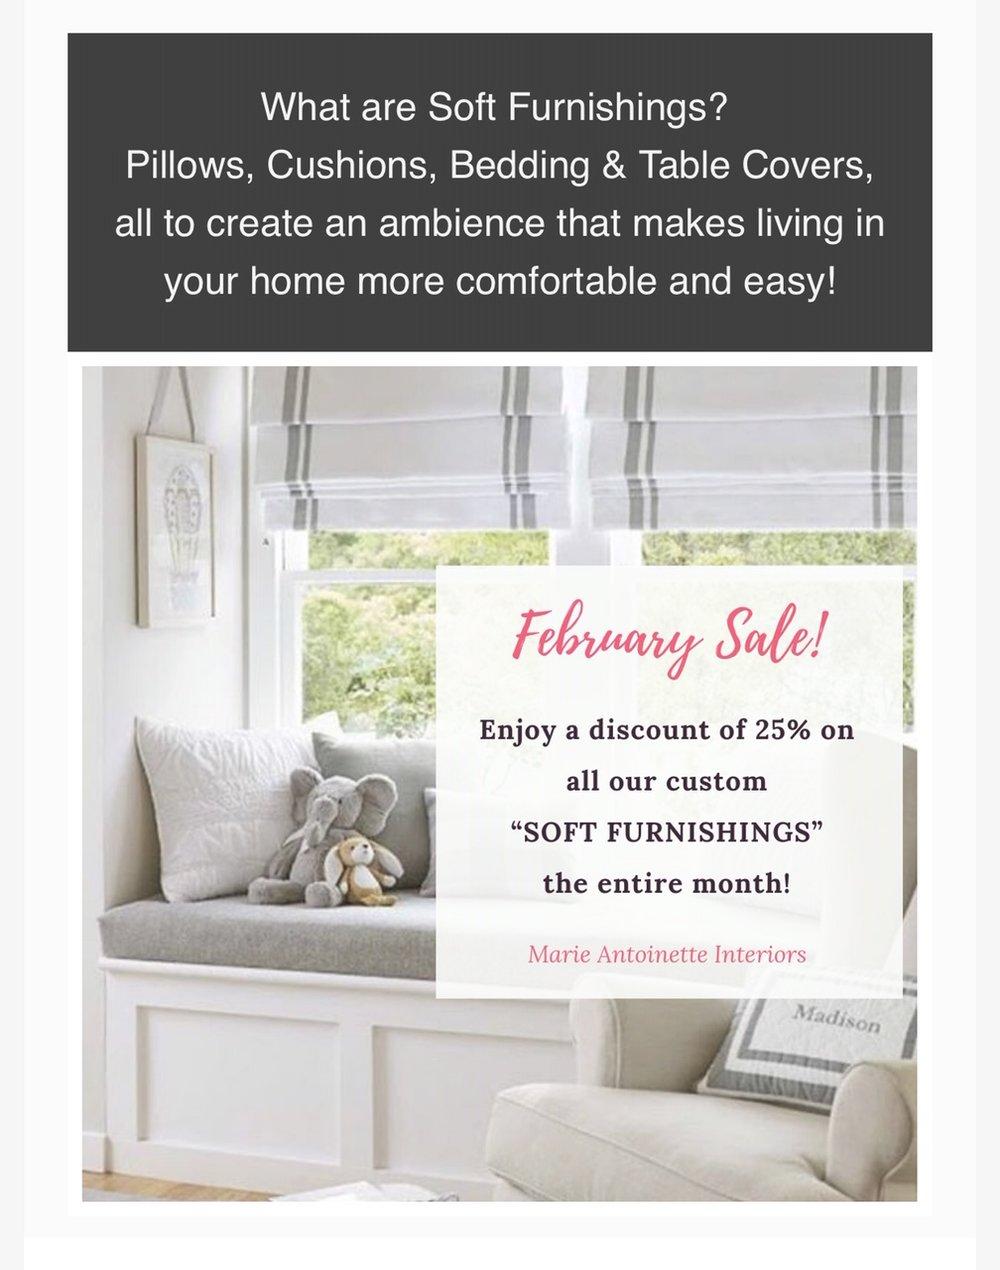 Soft Furnishings Sale.jpg